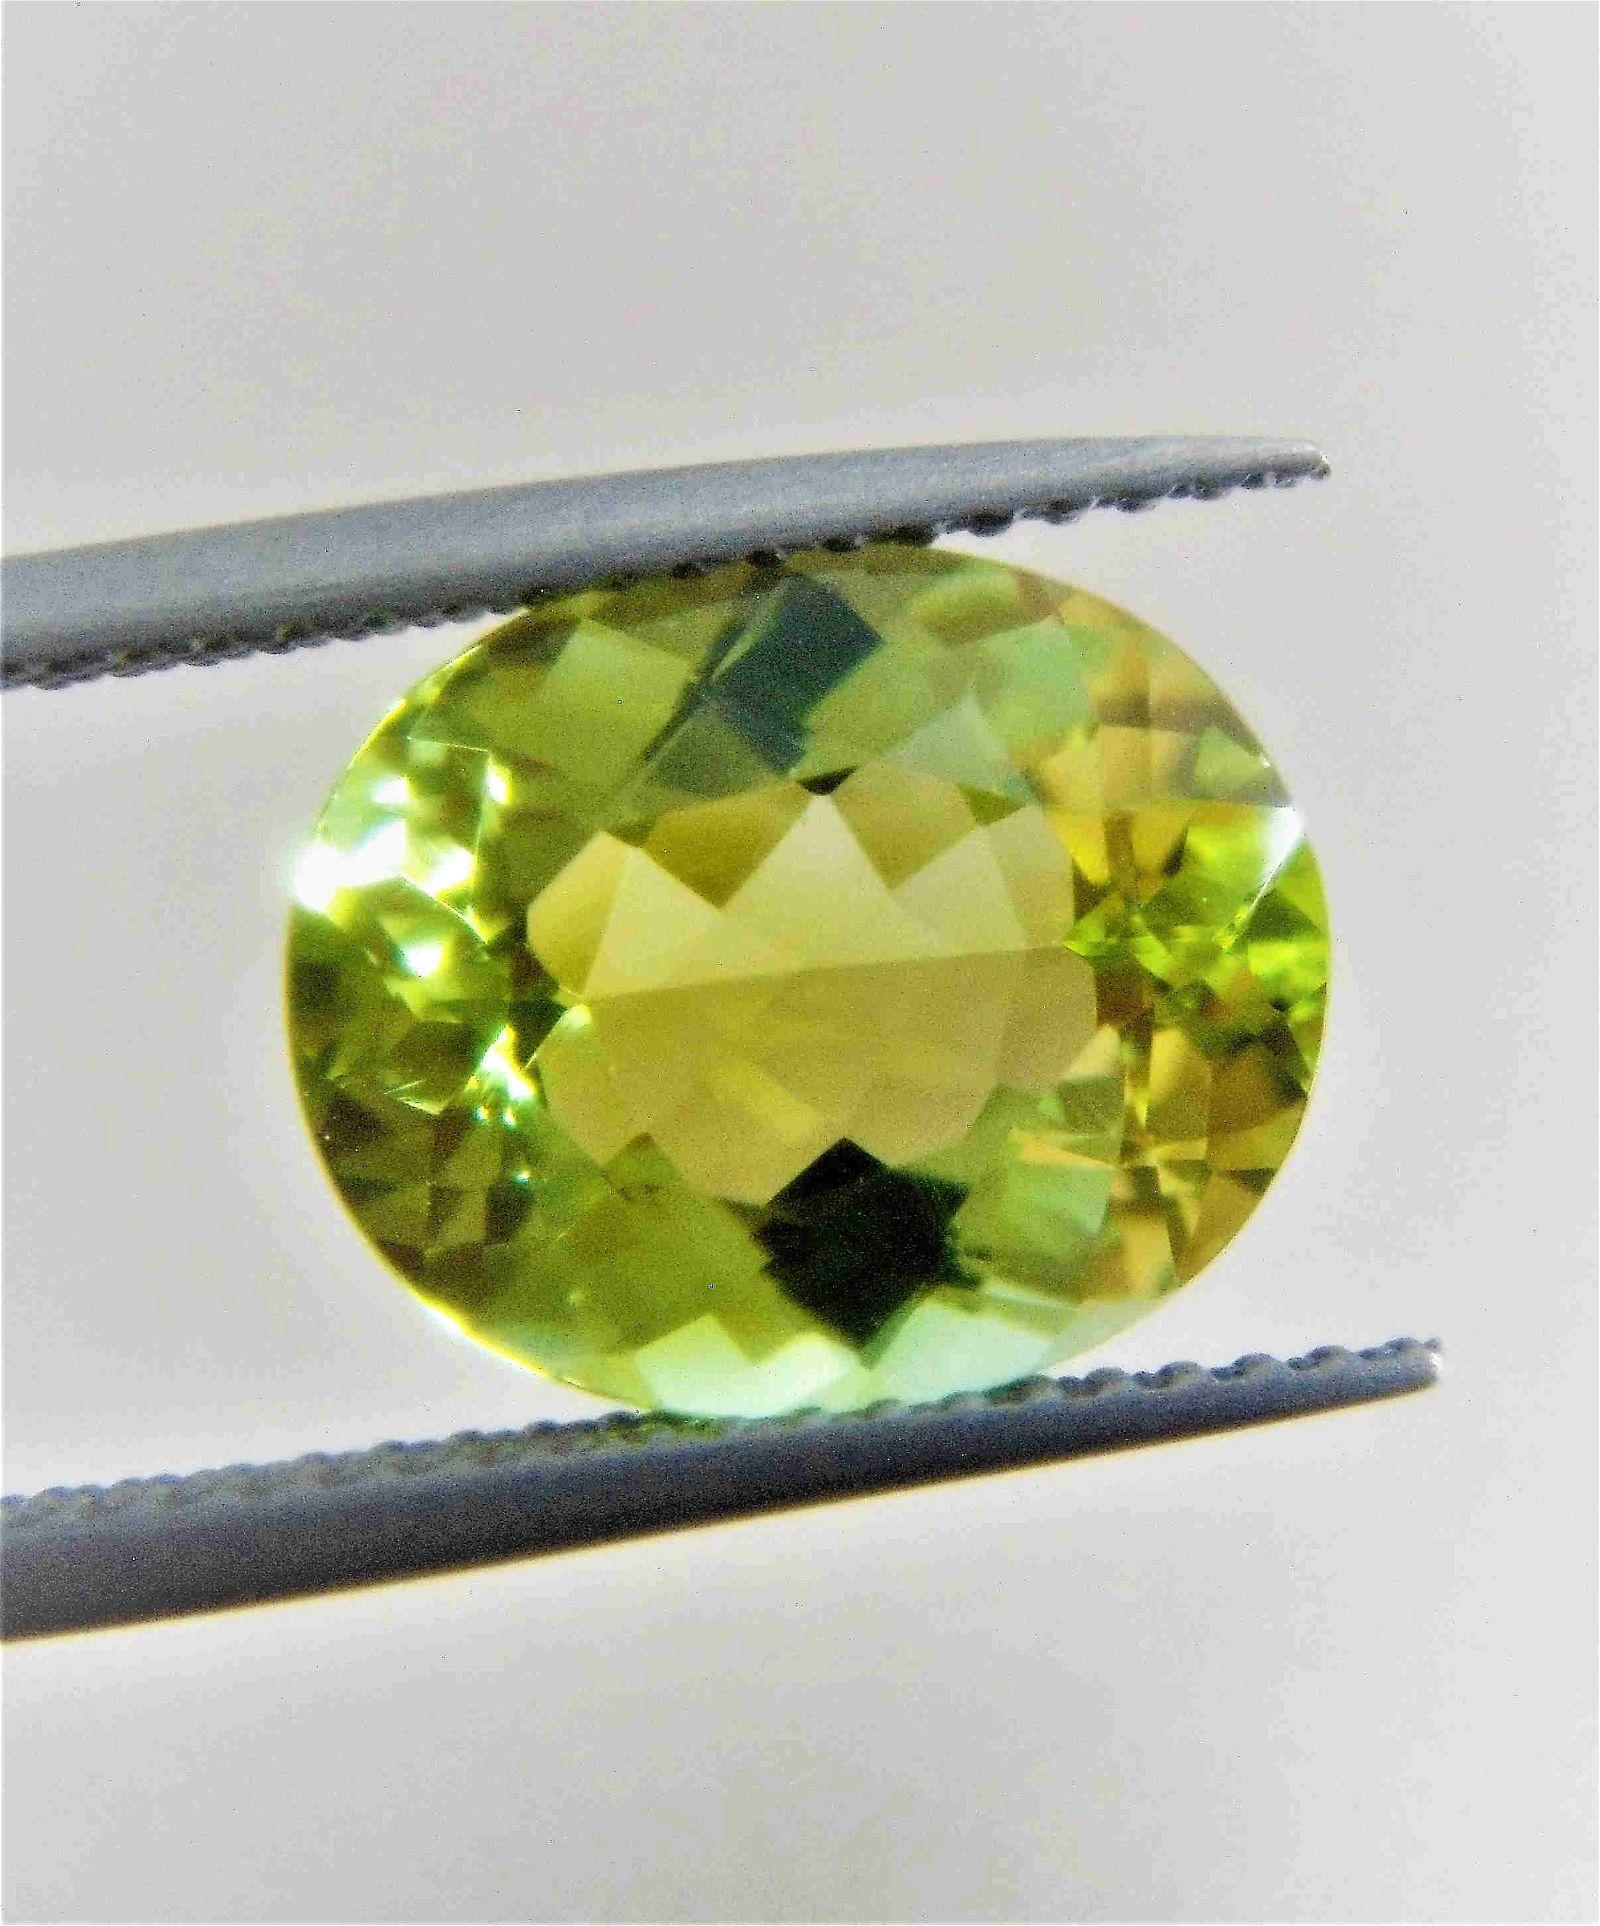 Green Tourmaline 10 x 12 MM Certified - 4.14 ct